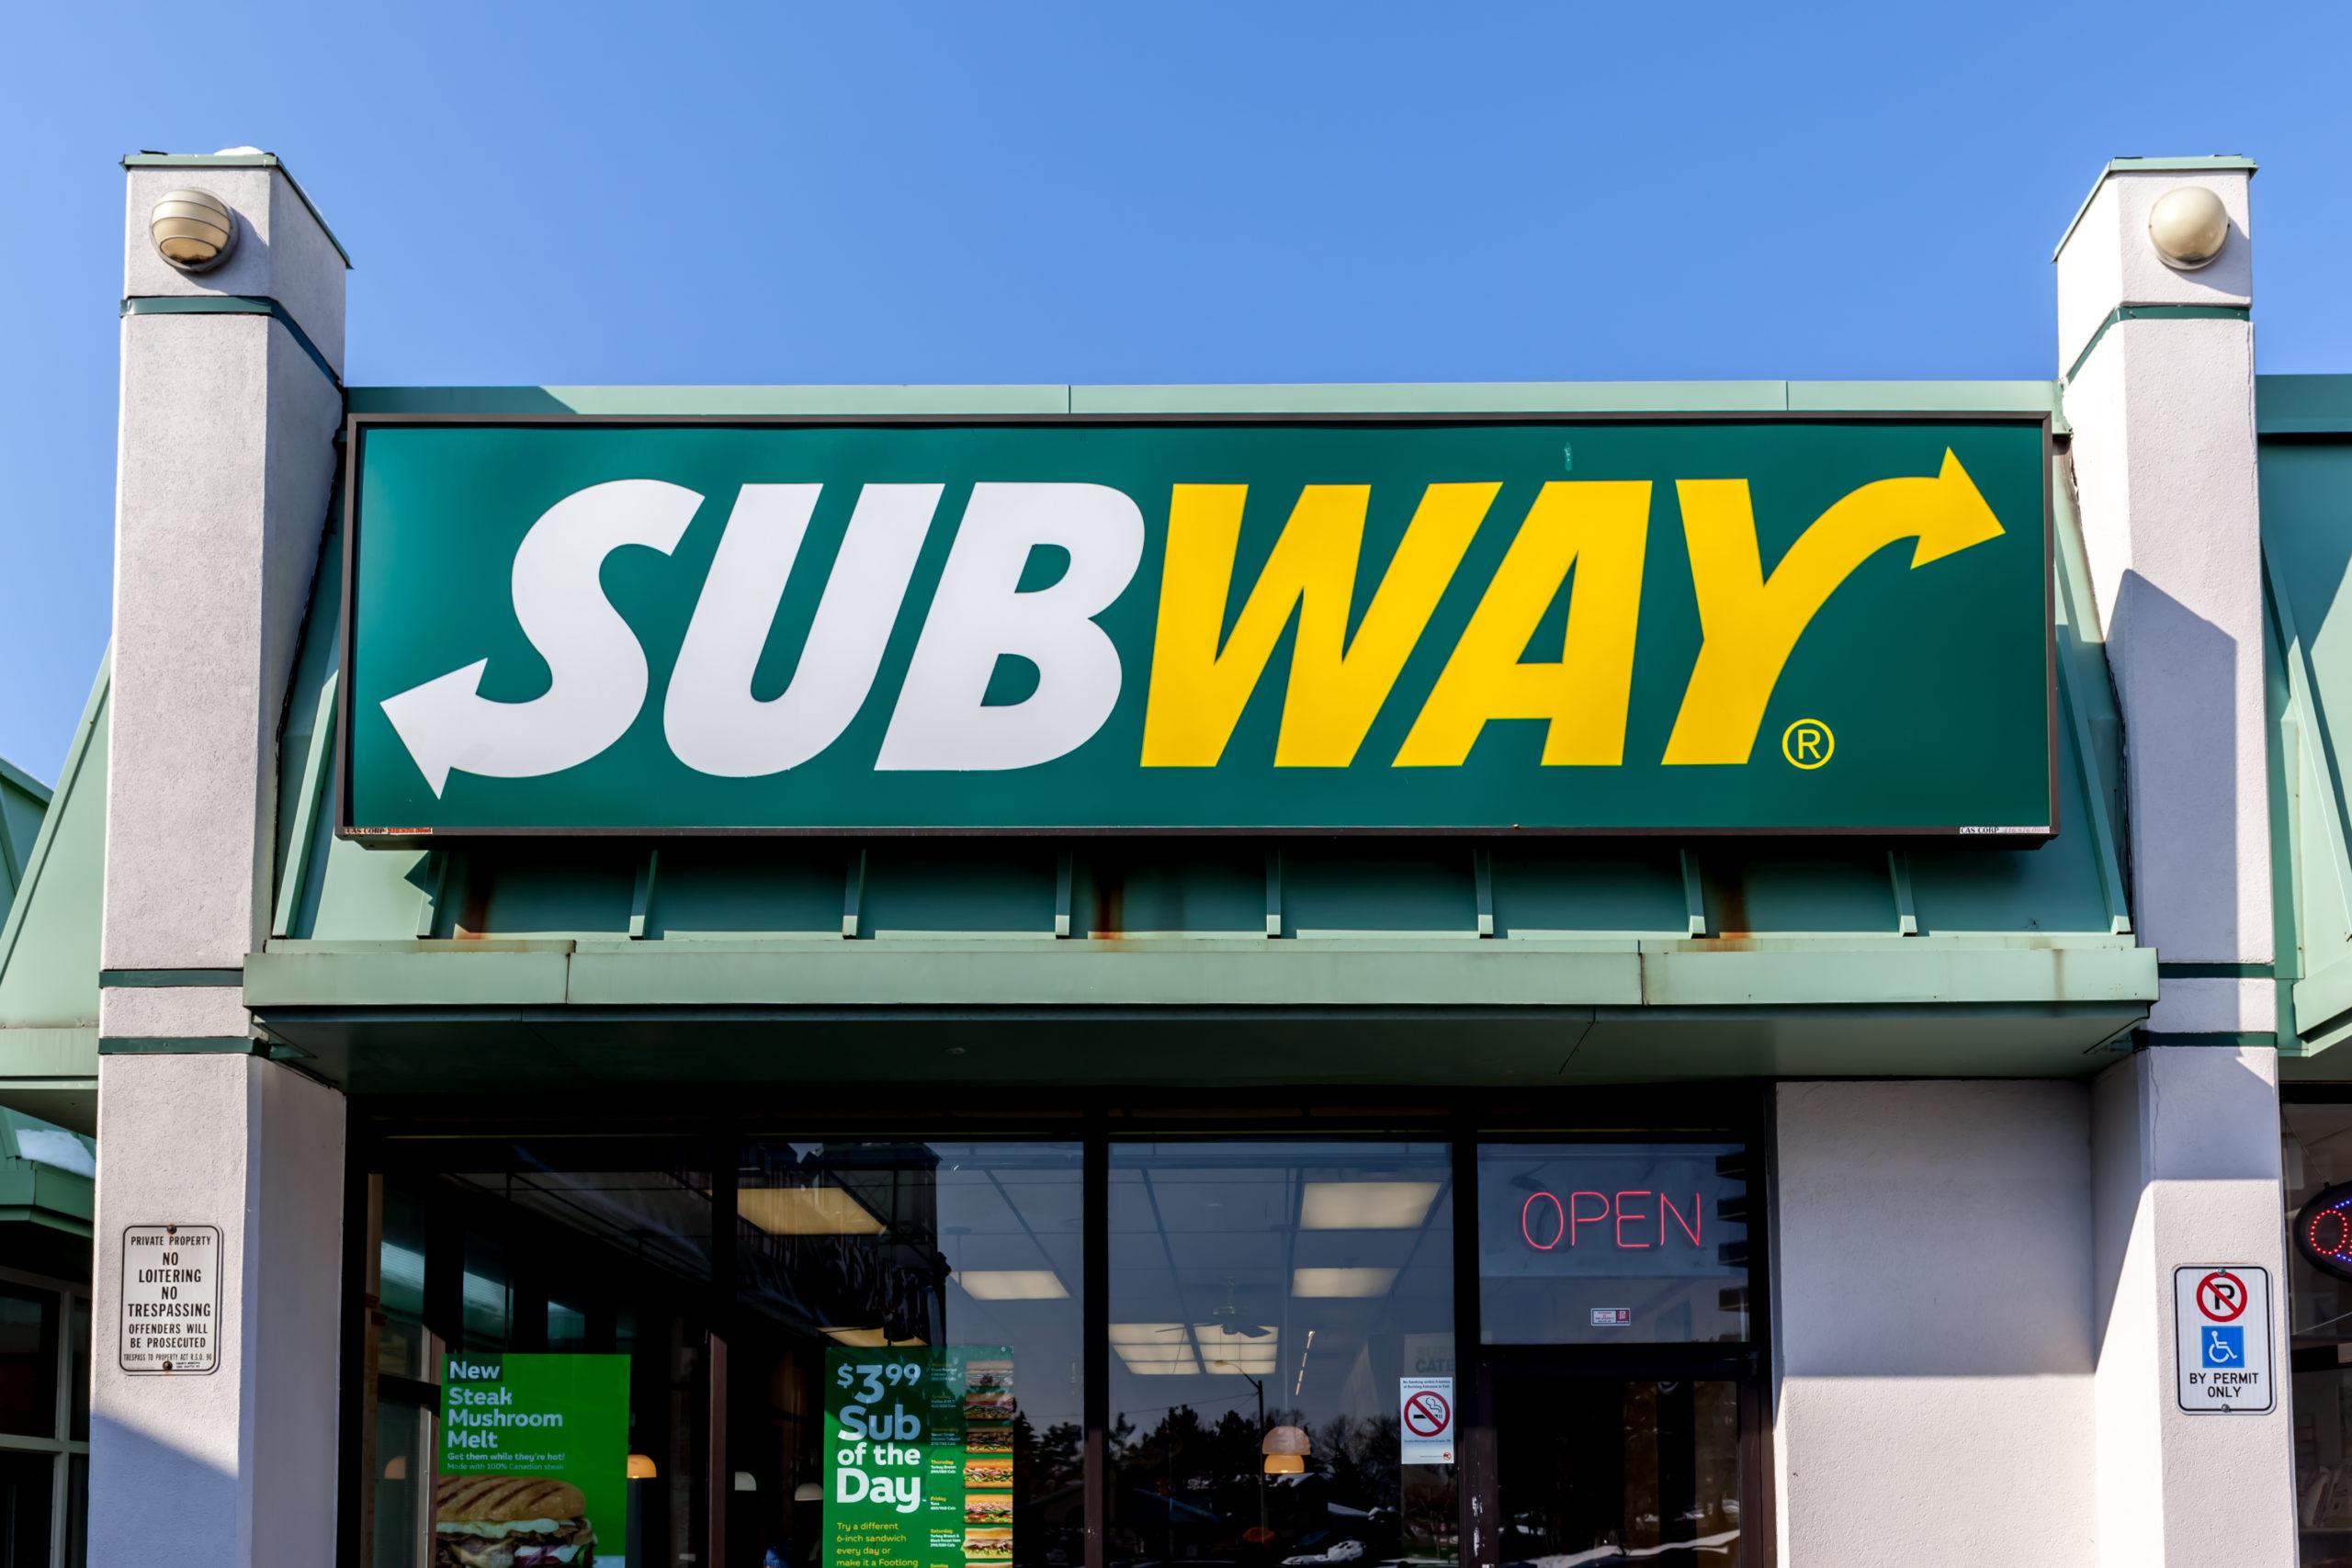 Subway Menu Prices in Canada - February